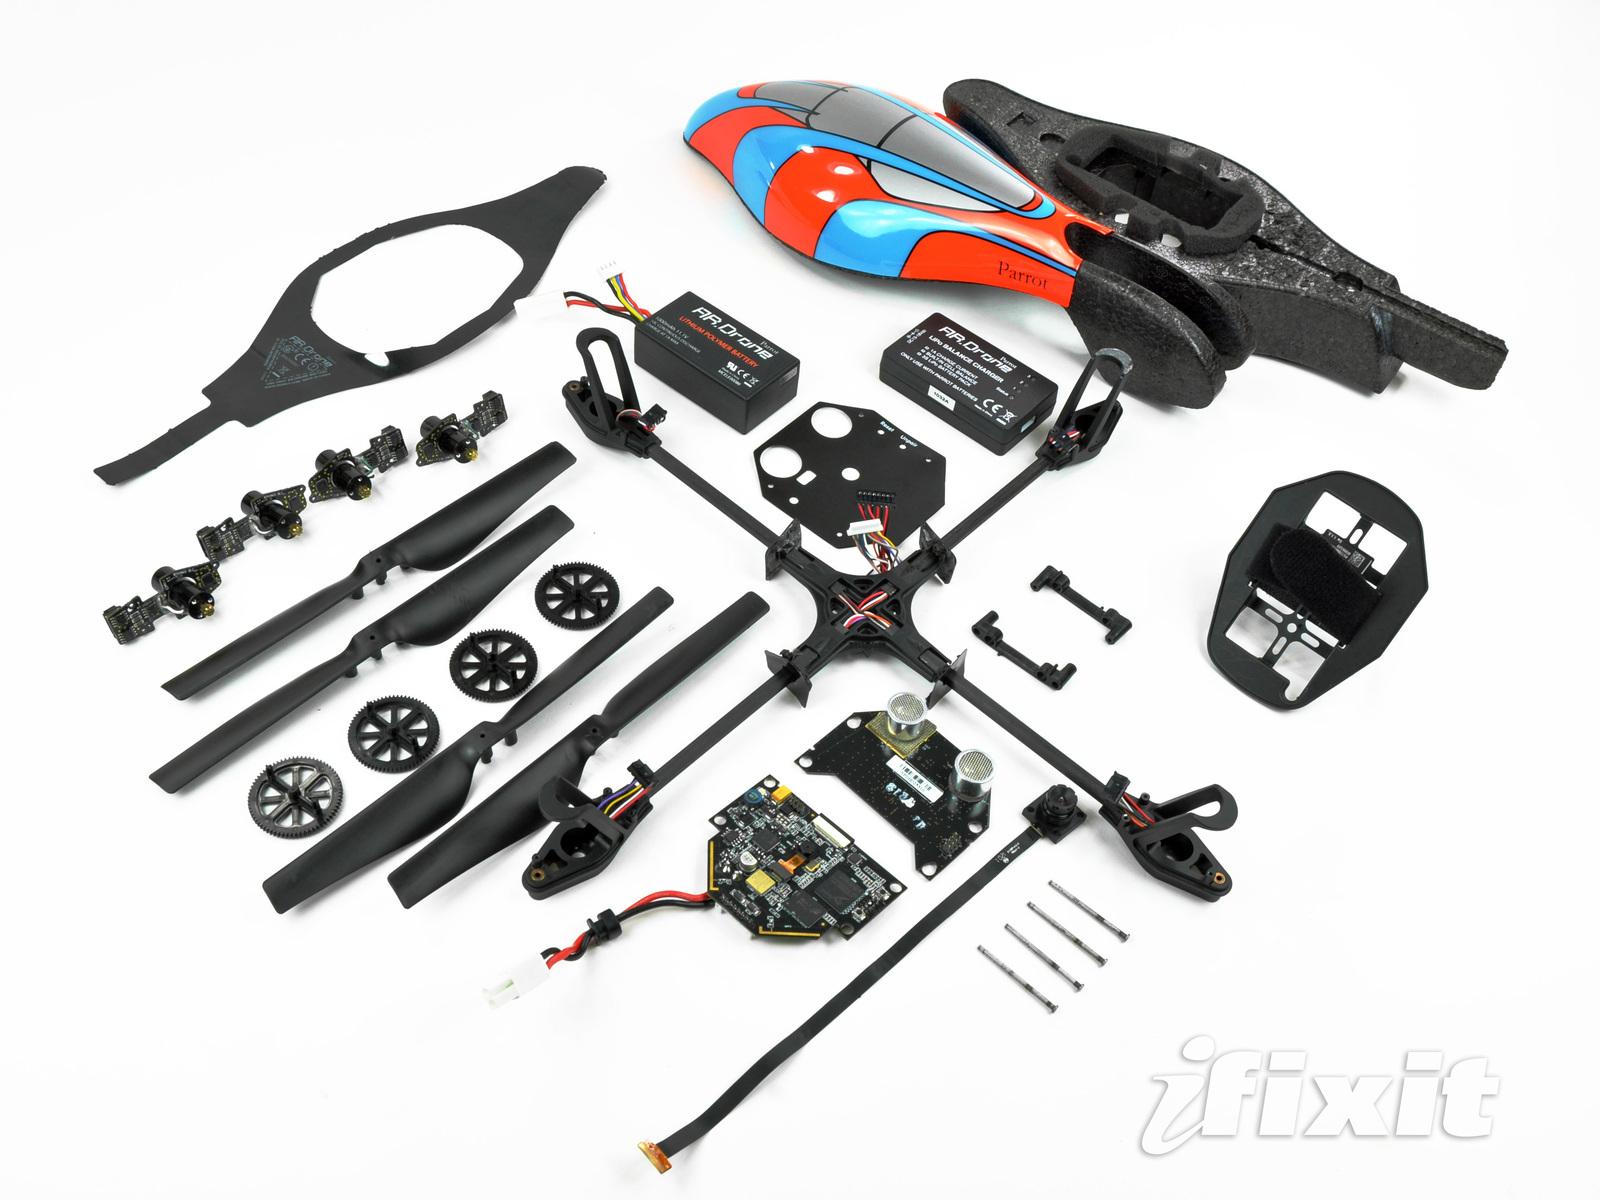 Parrot AR.Drone quadcopter teardown